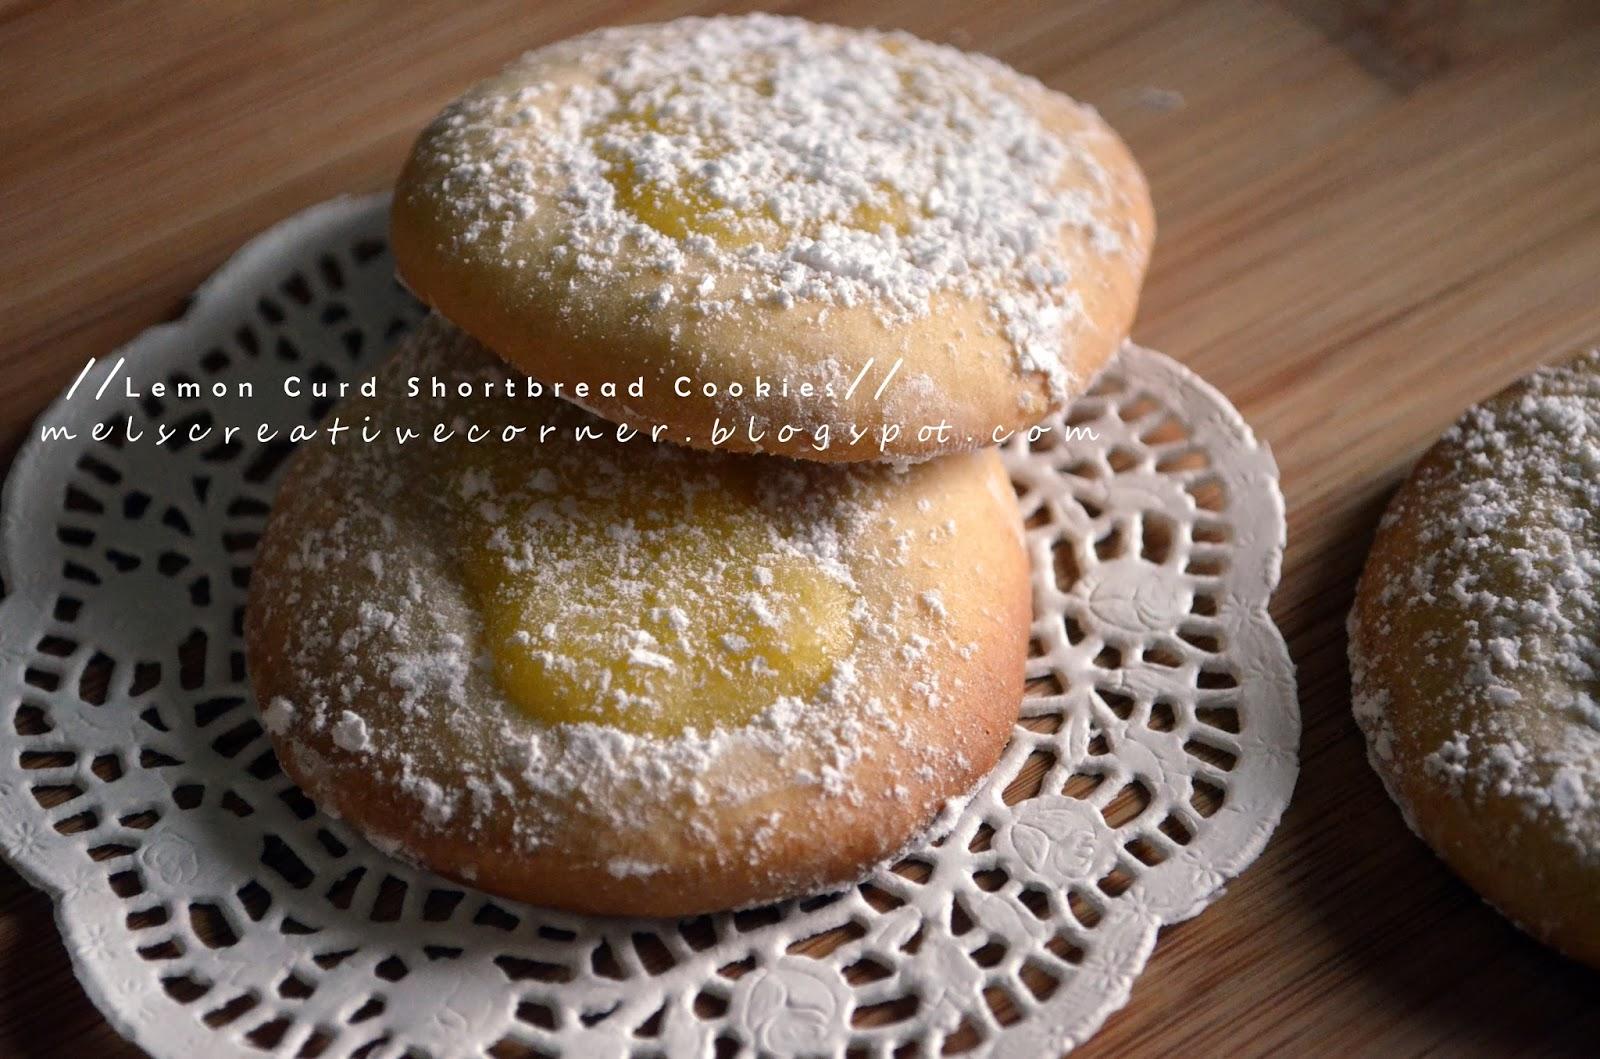 Mel's Creative Corner: Lemon Curd Shortbread Cookies!